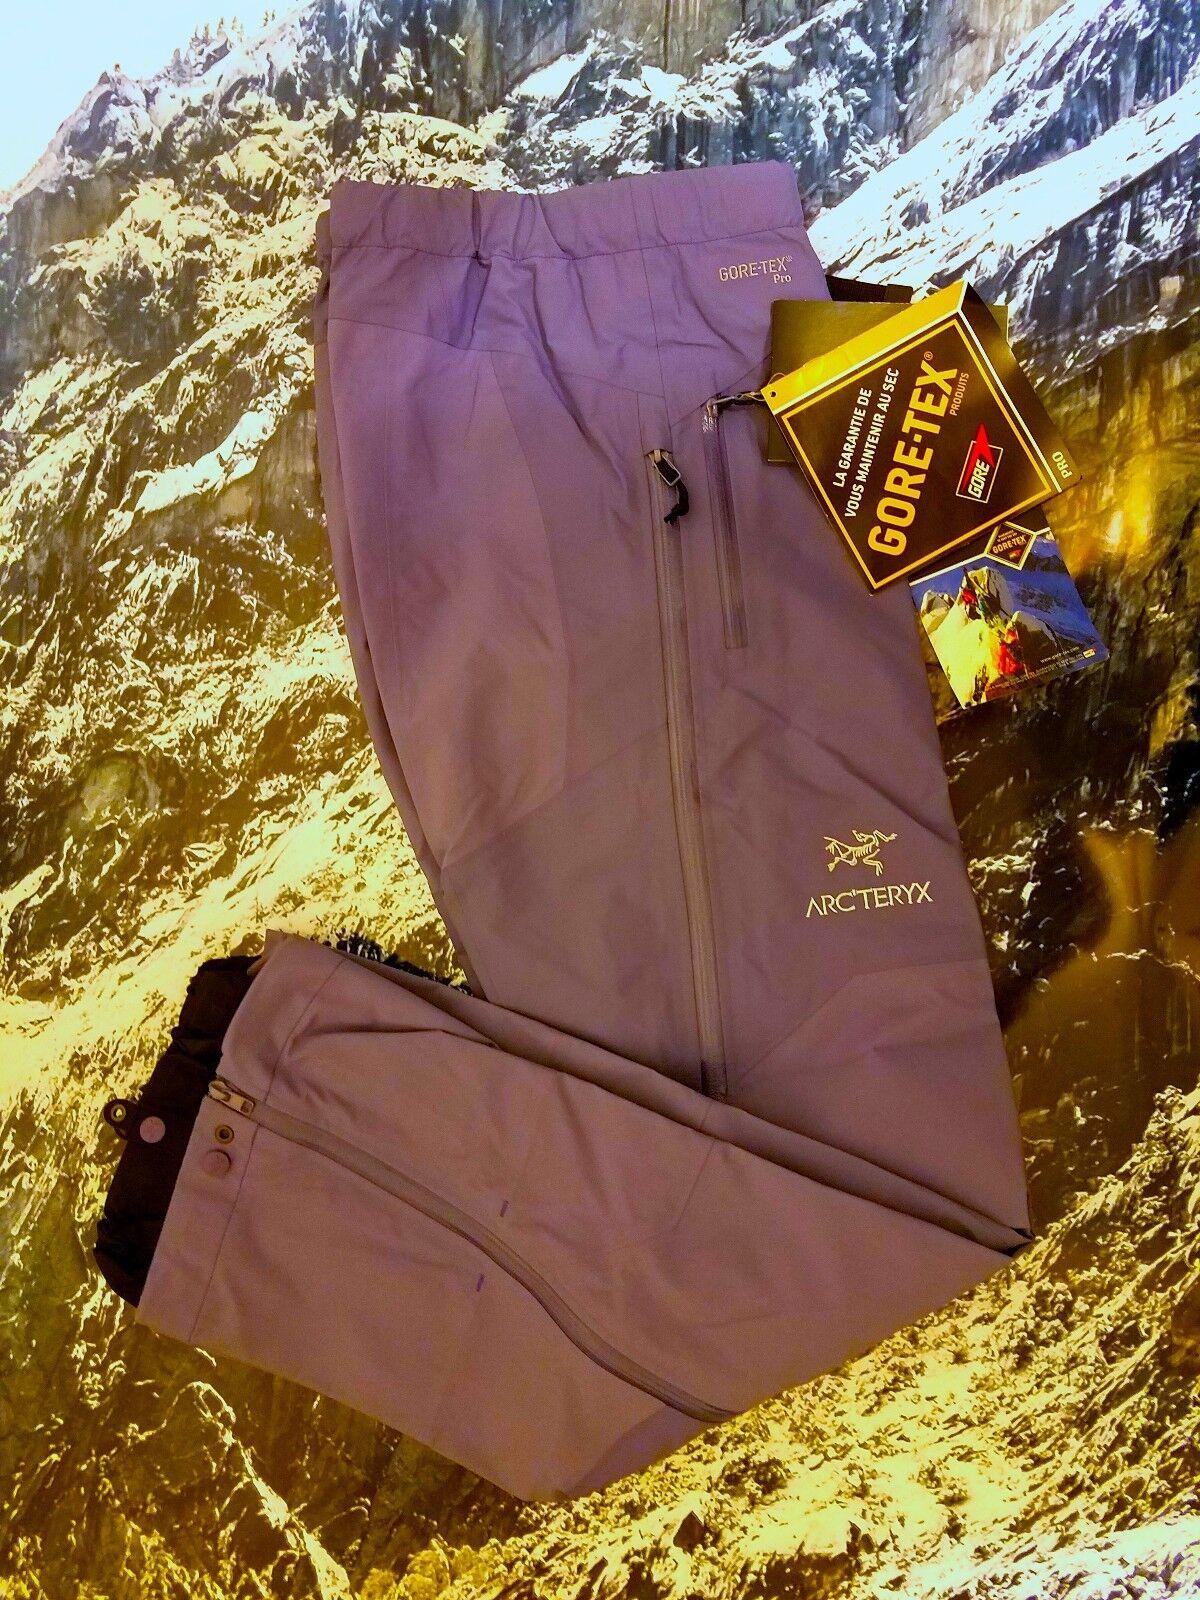 ARC'TERYX BETA AR Damenschuhe Pants Medium GORE TEX Winter Iris Farbe, BRAND NEW